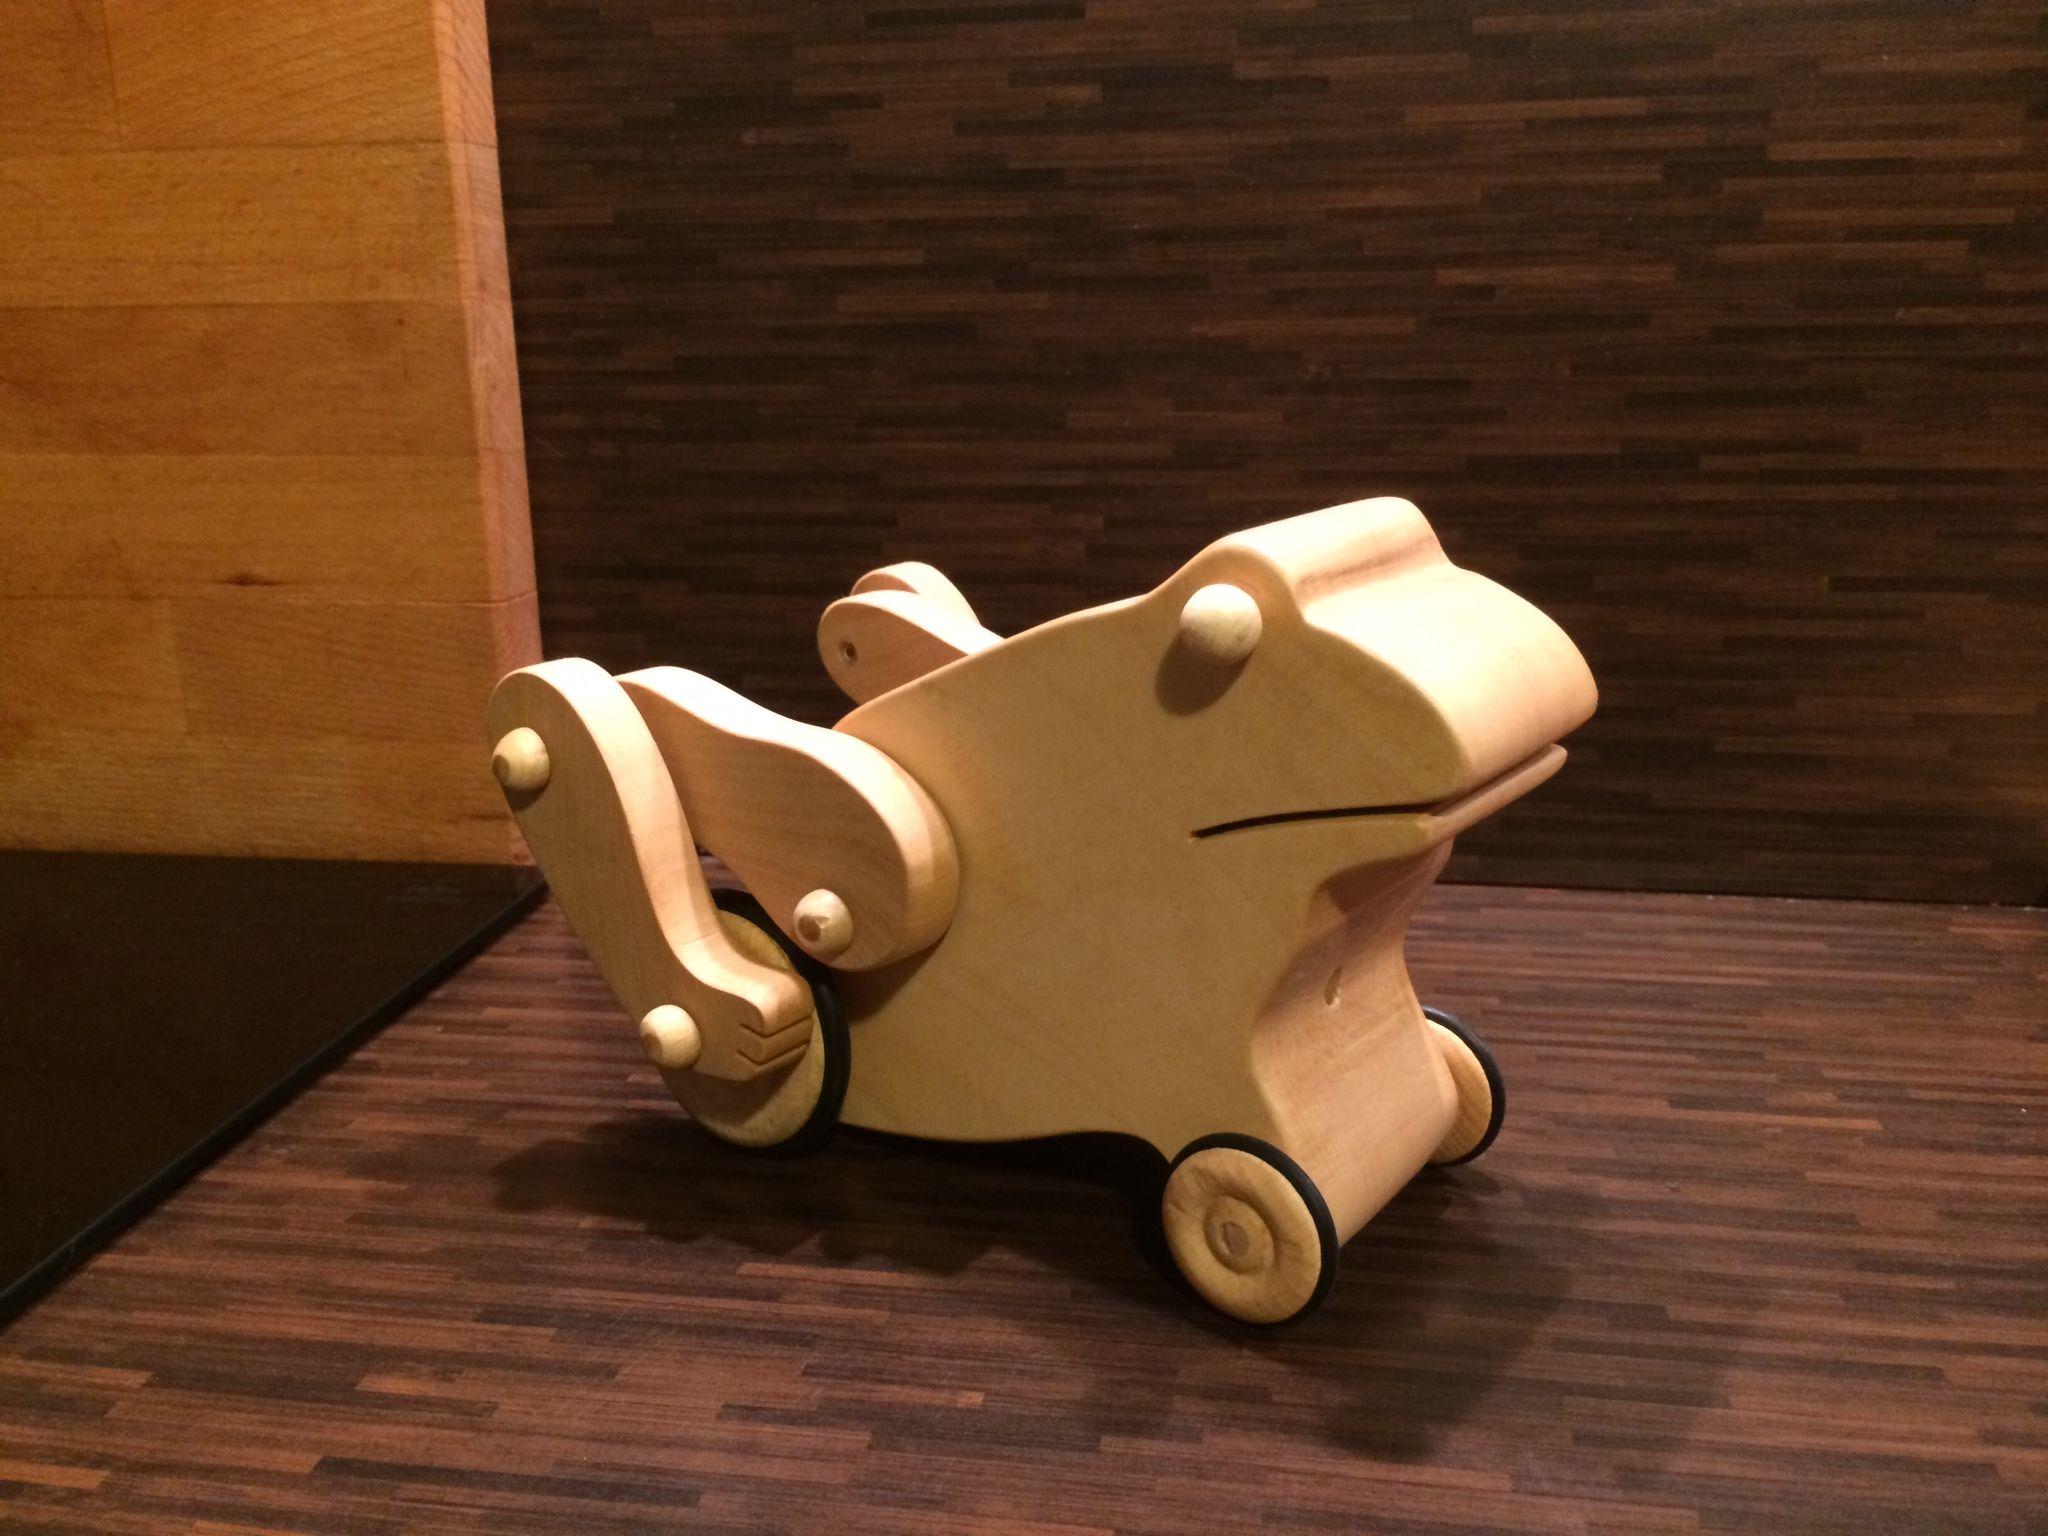 kinder spielzeug h pfender frosch bauanleitung zum selber bauen div pinterest. Black Bedroom Furniture Sets. Home Design Ideas